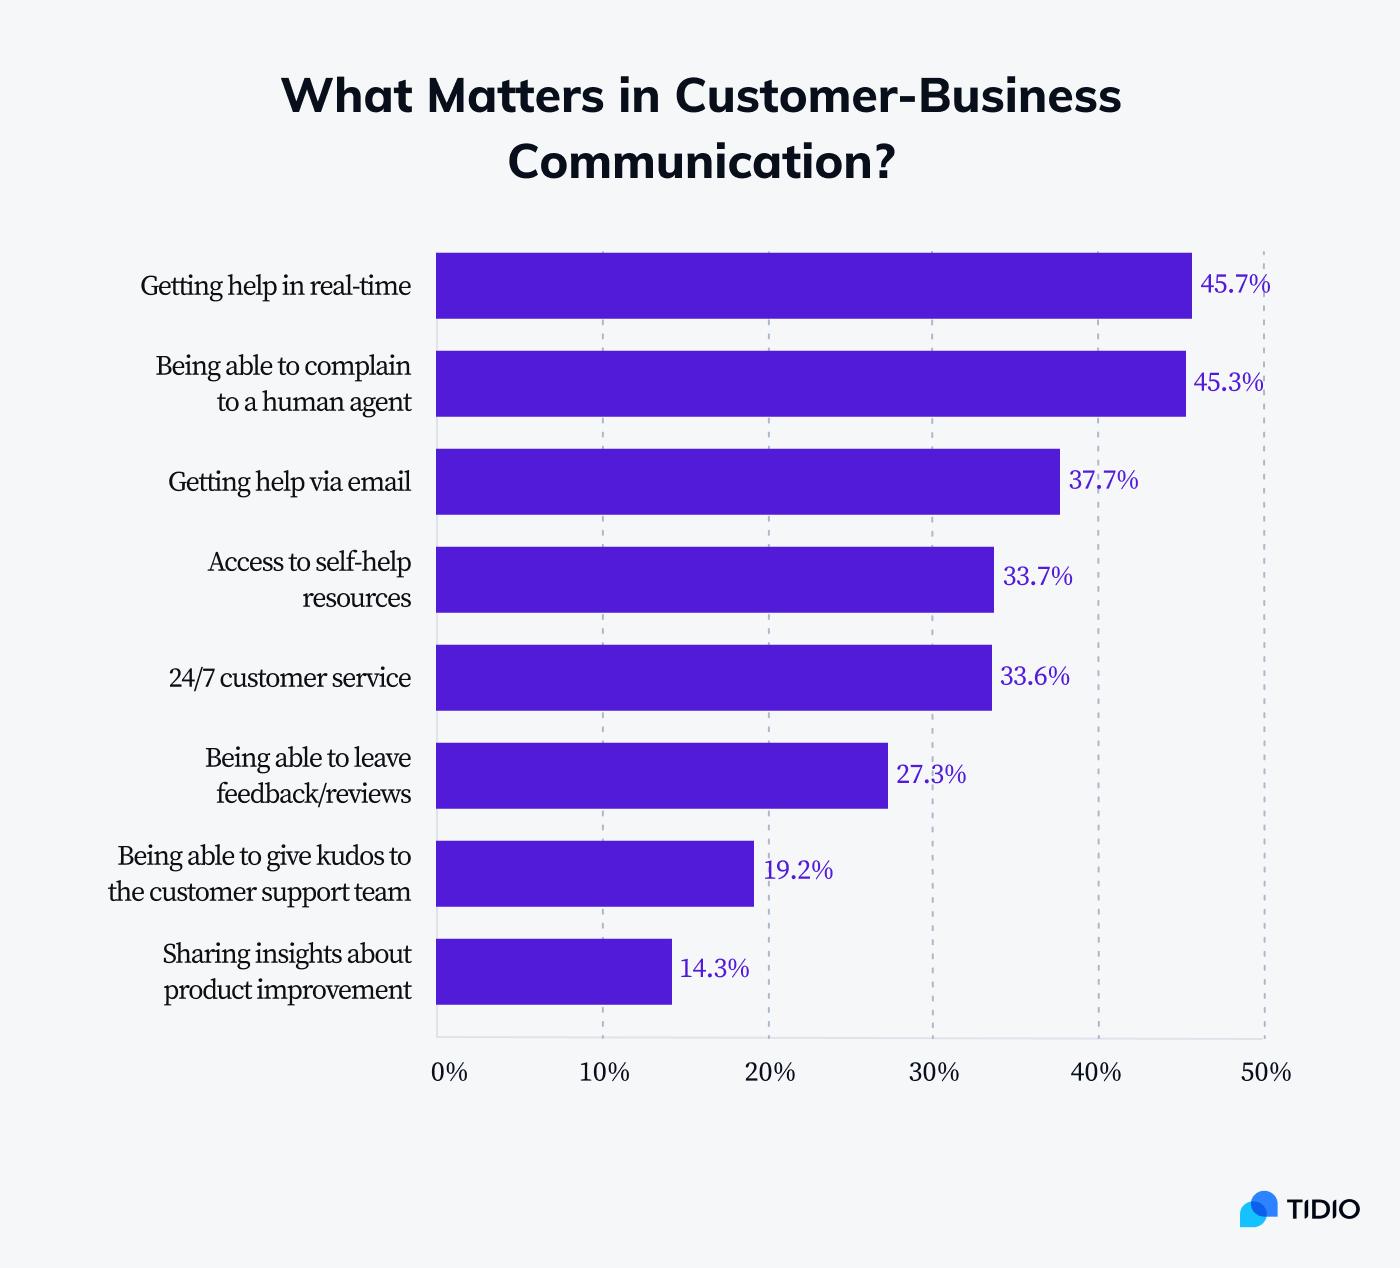 Factors that matter in customer-business communication